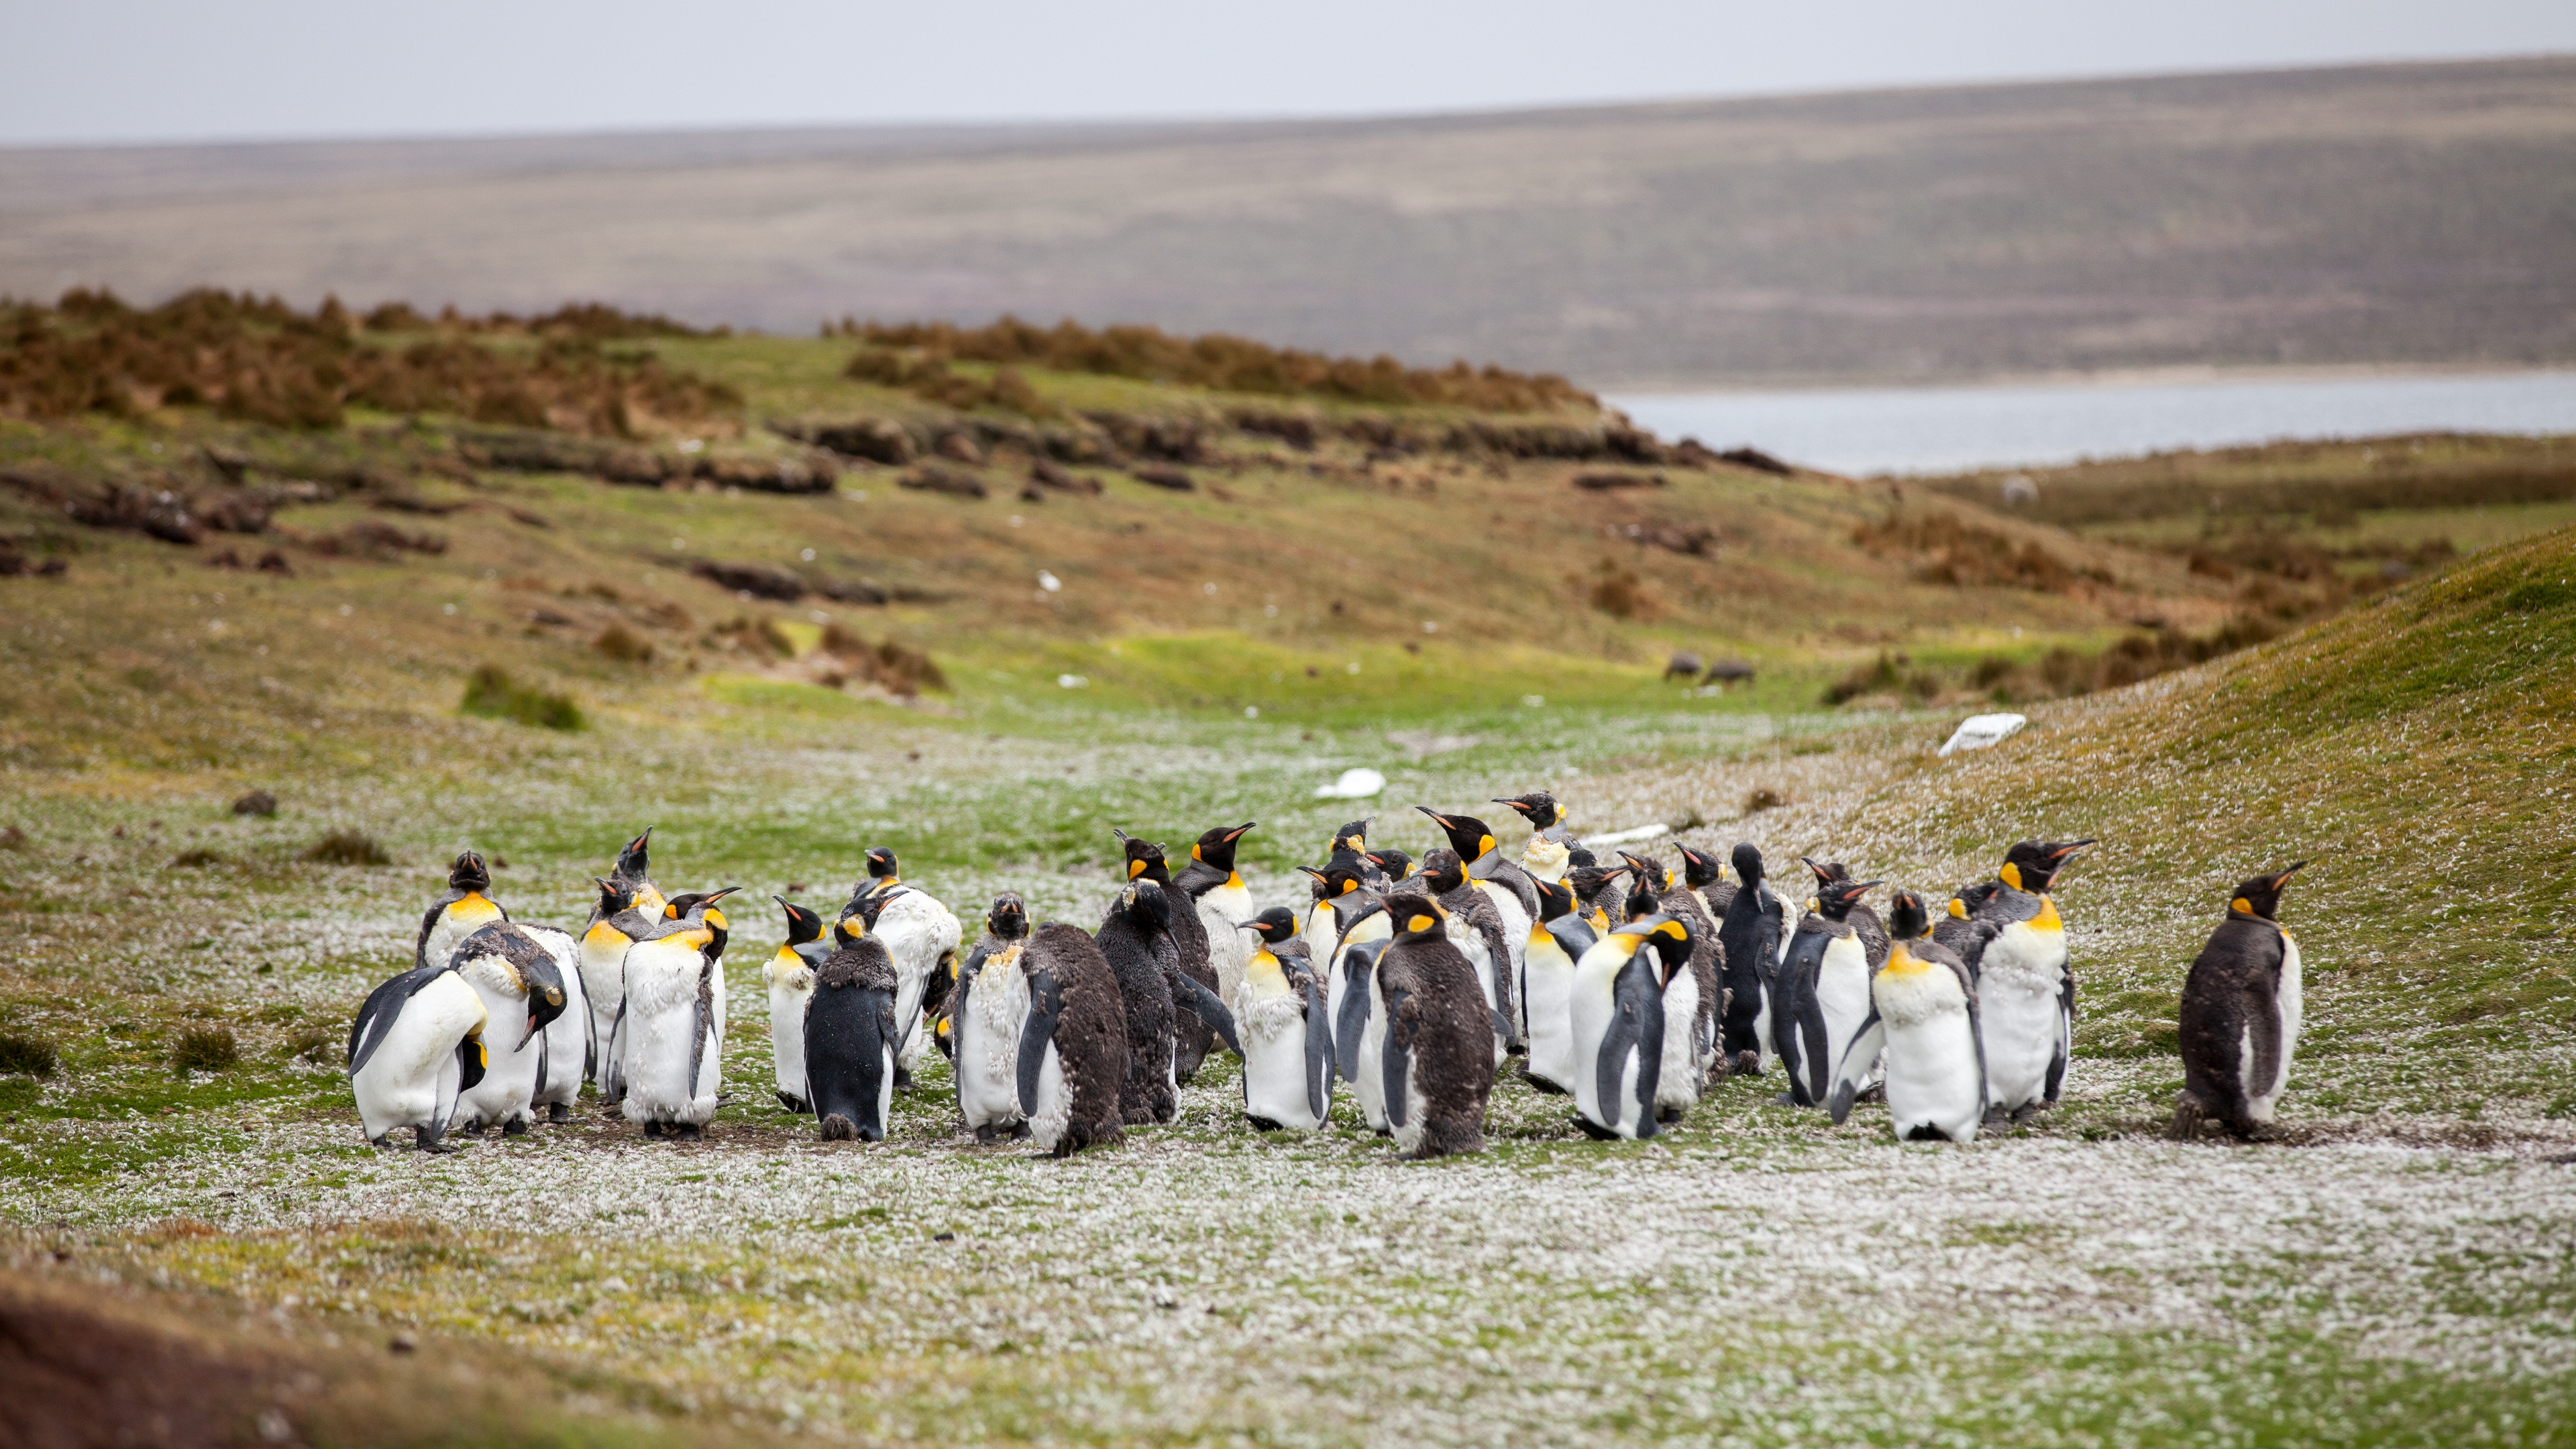 penguins flock grass shore 4k 1542243058 - penguins, flock, grass, shore 4k - Penguins, Grass, flock